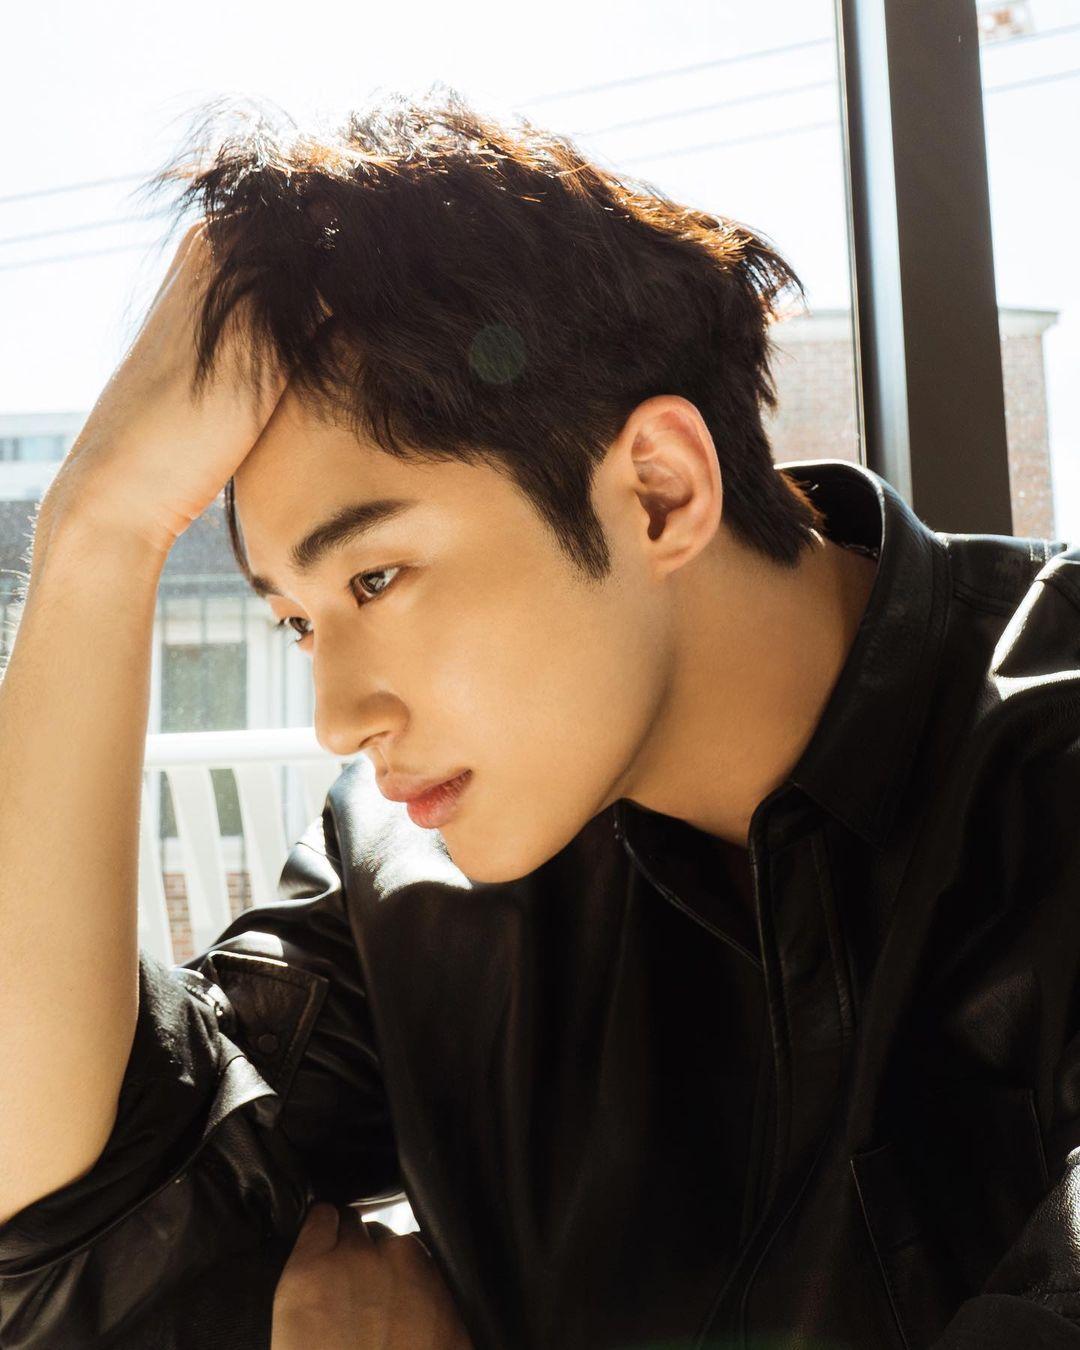 Is Byeon Woo Seok Bench's newest Korean endorser?